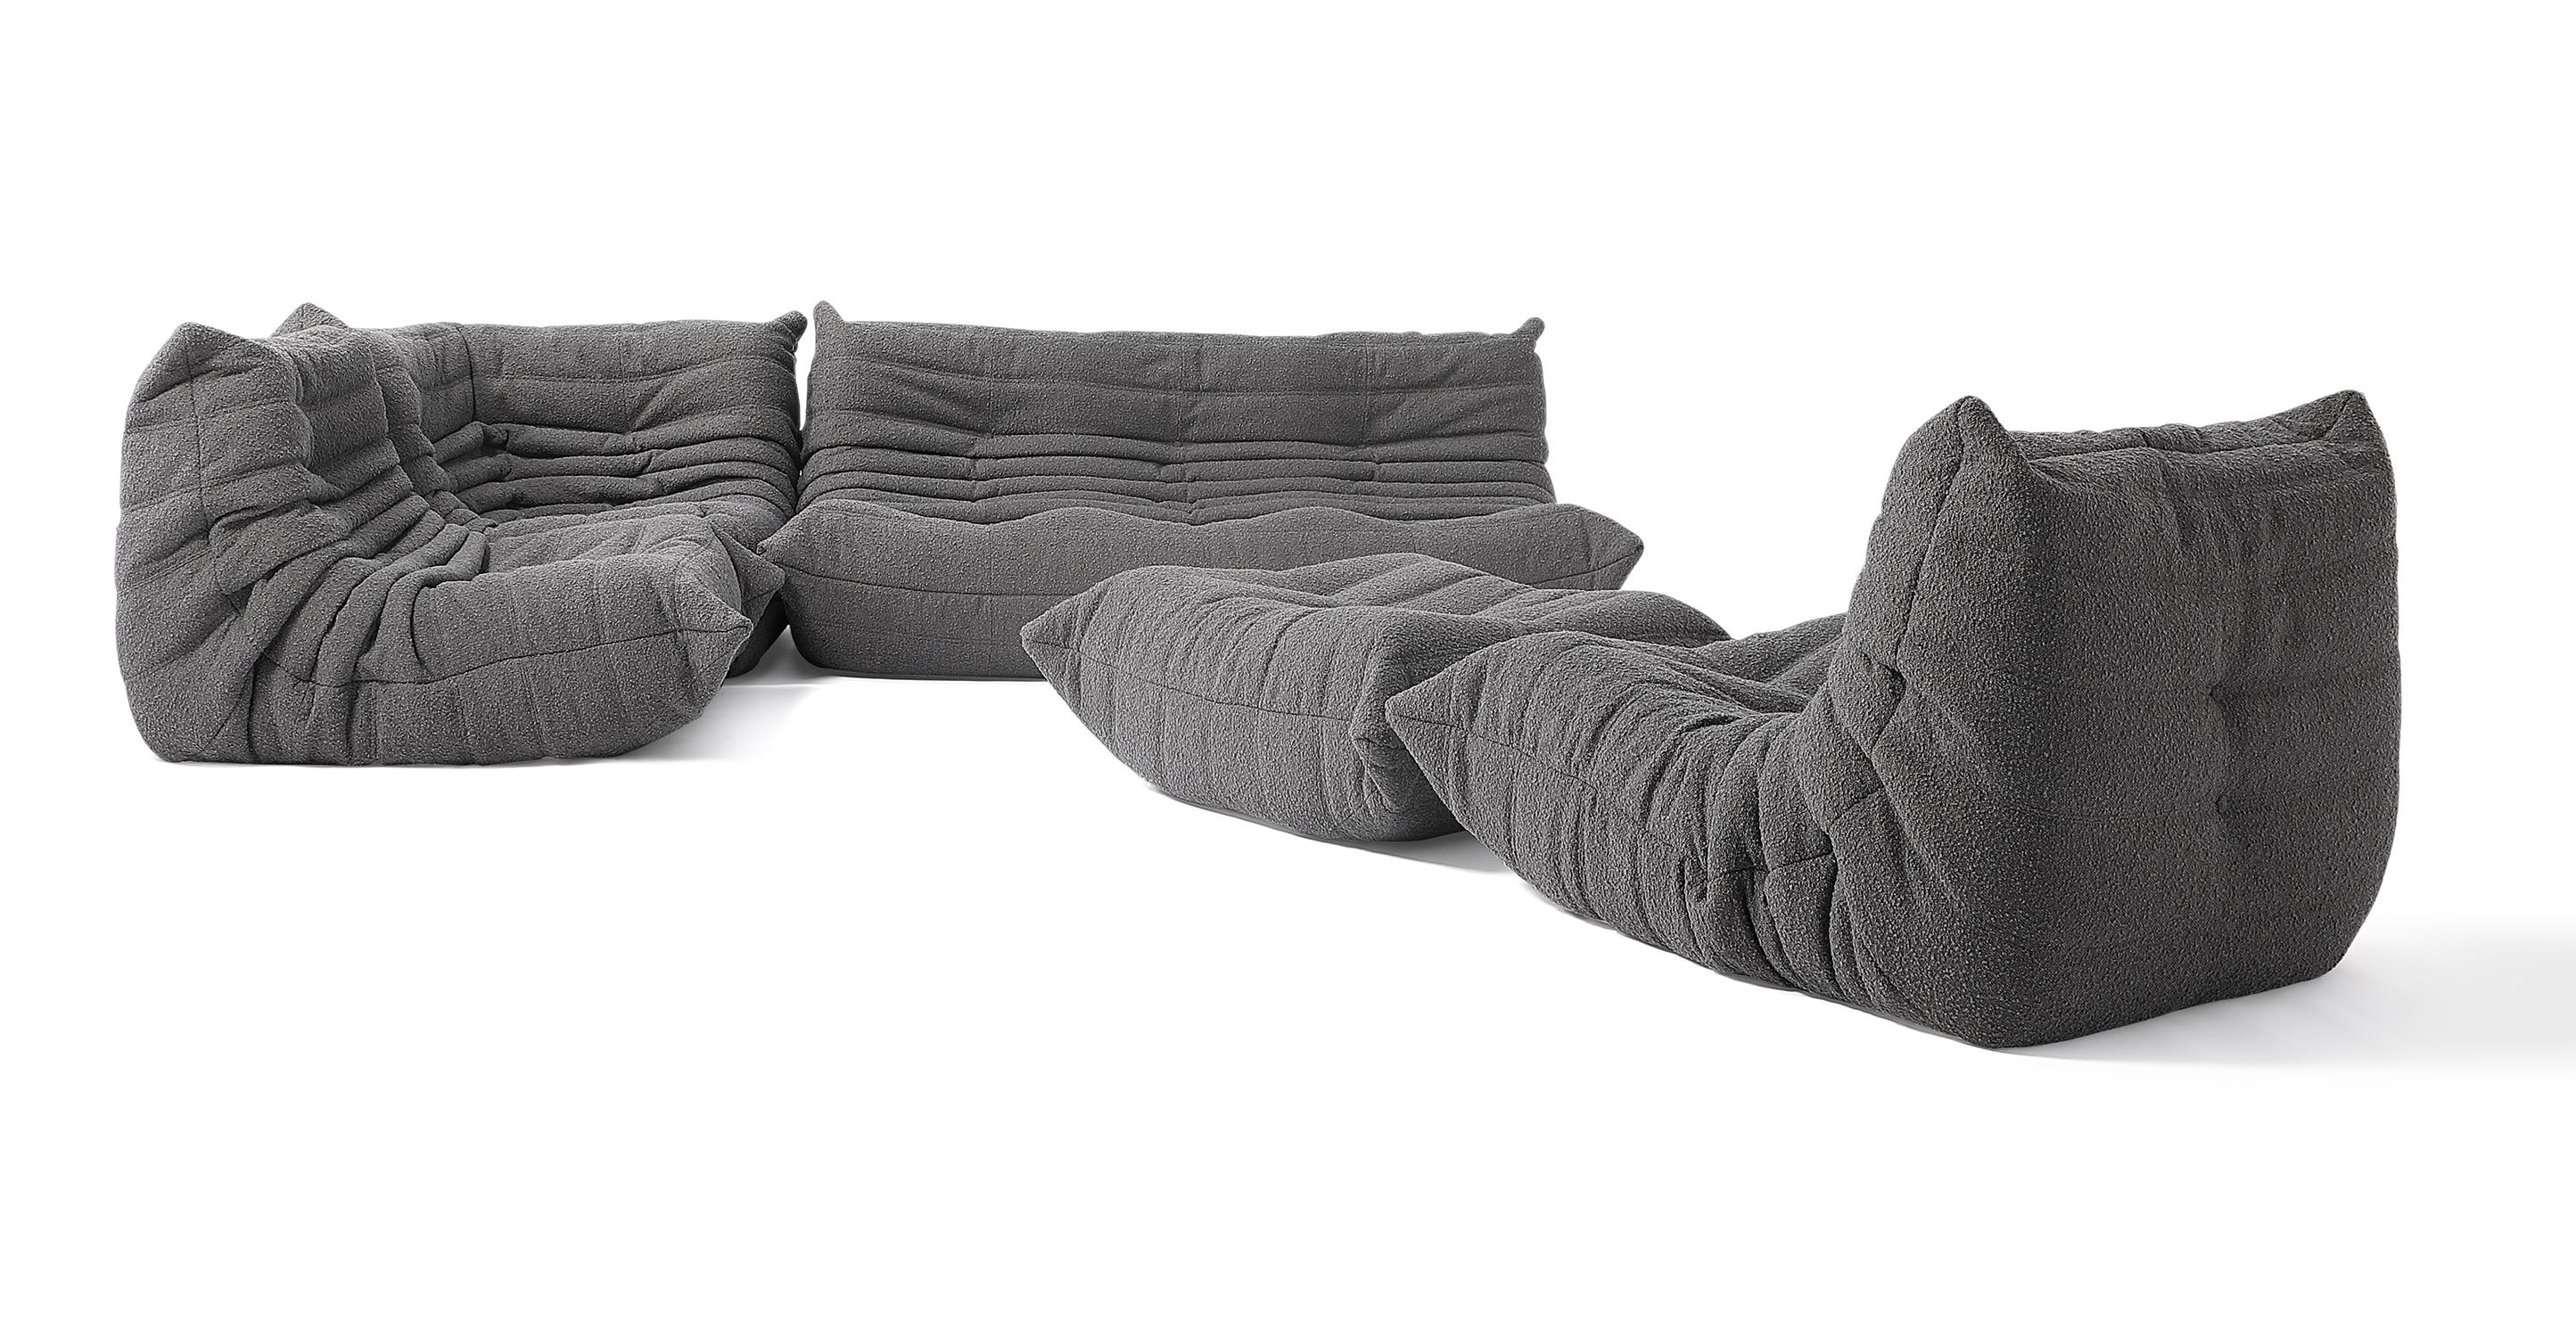 "Louvre Modular 110"" Milo 5-pc Fabric Sofa, Gris Boucle"